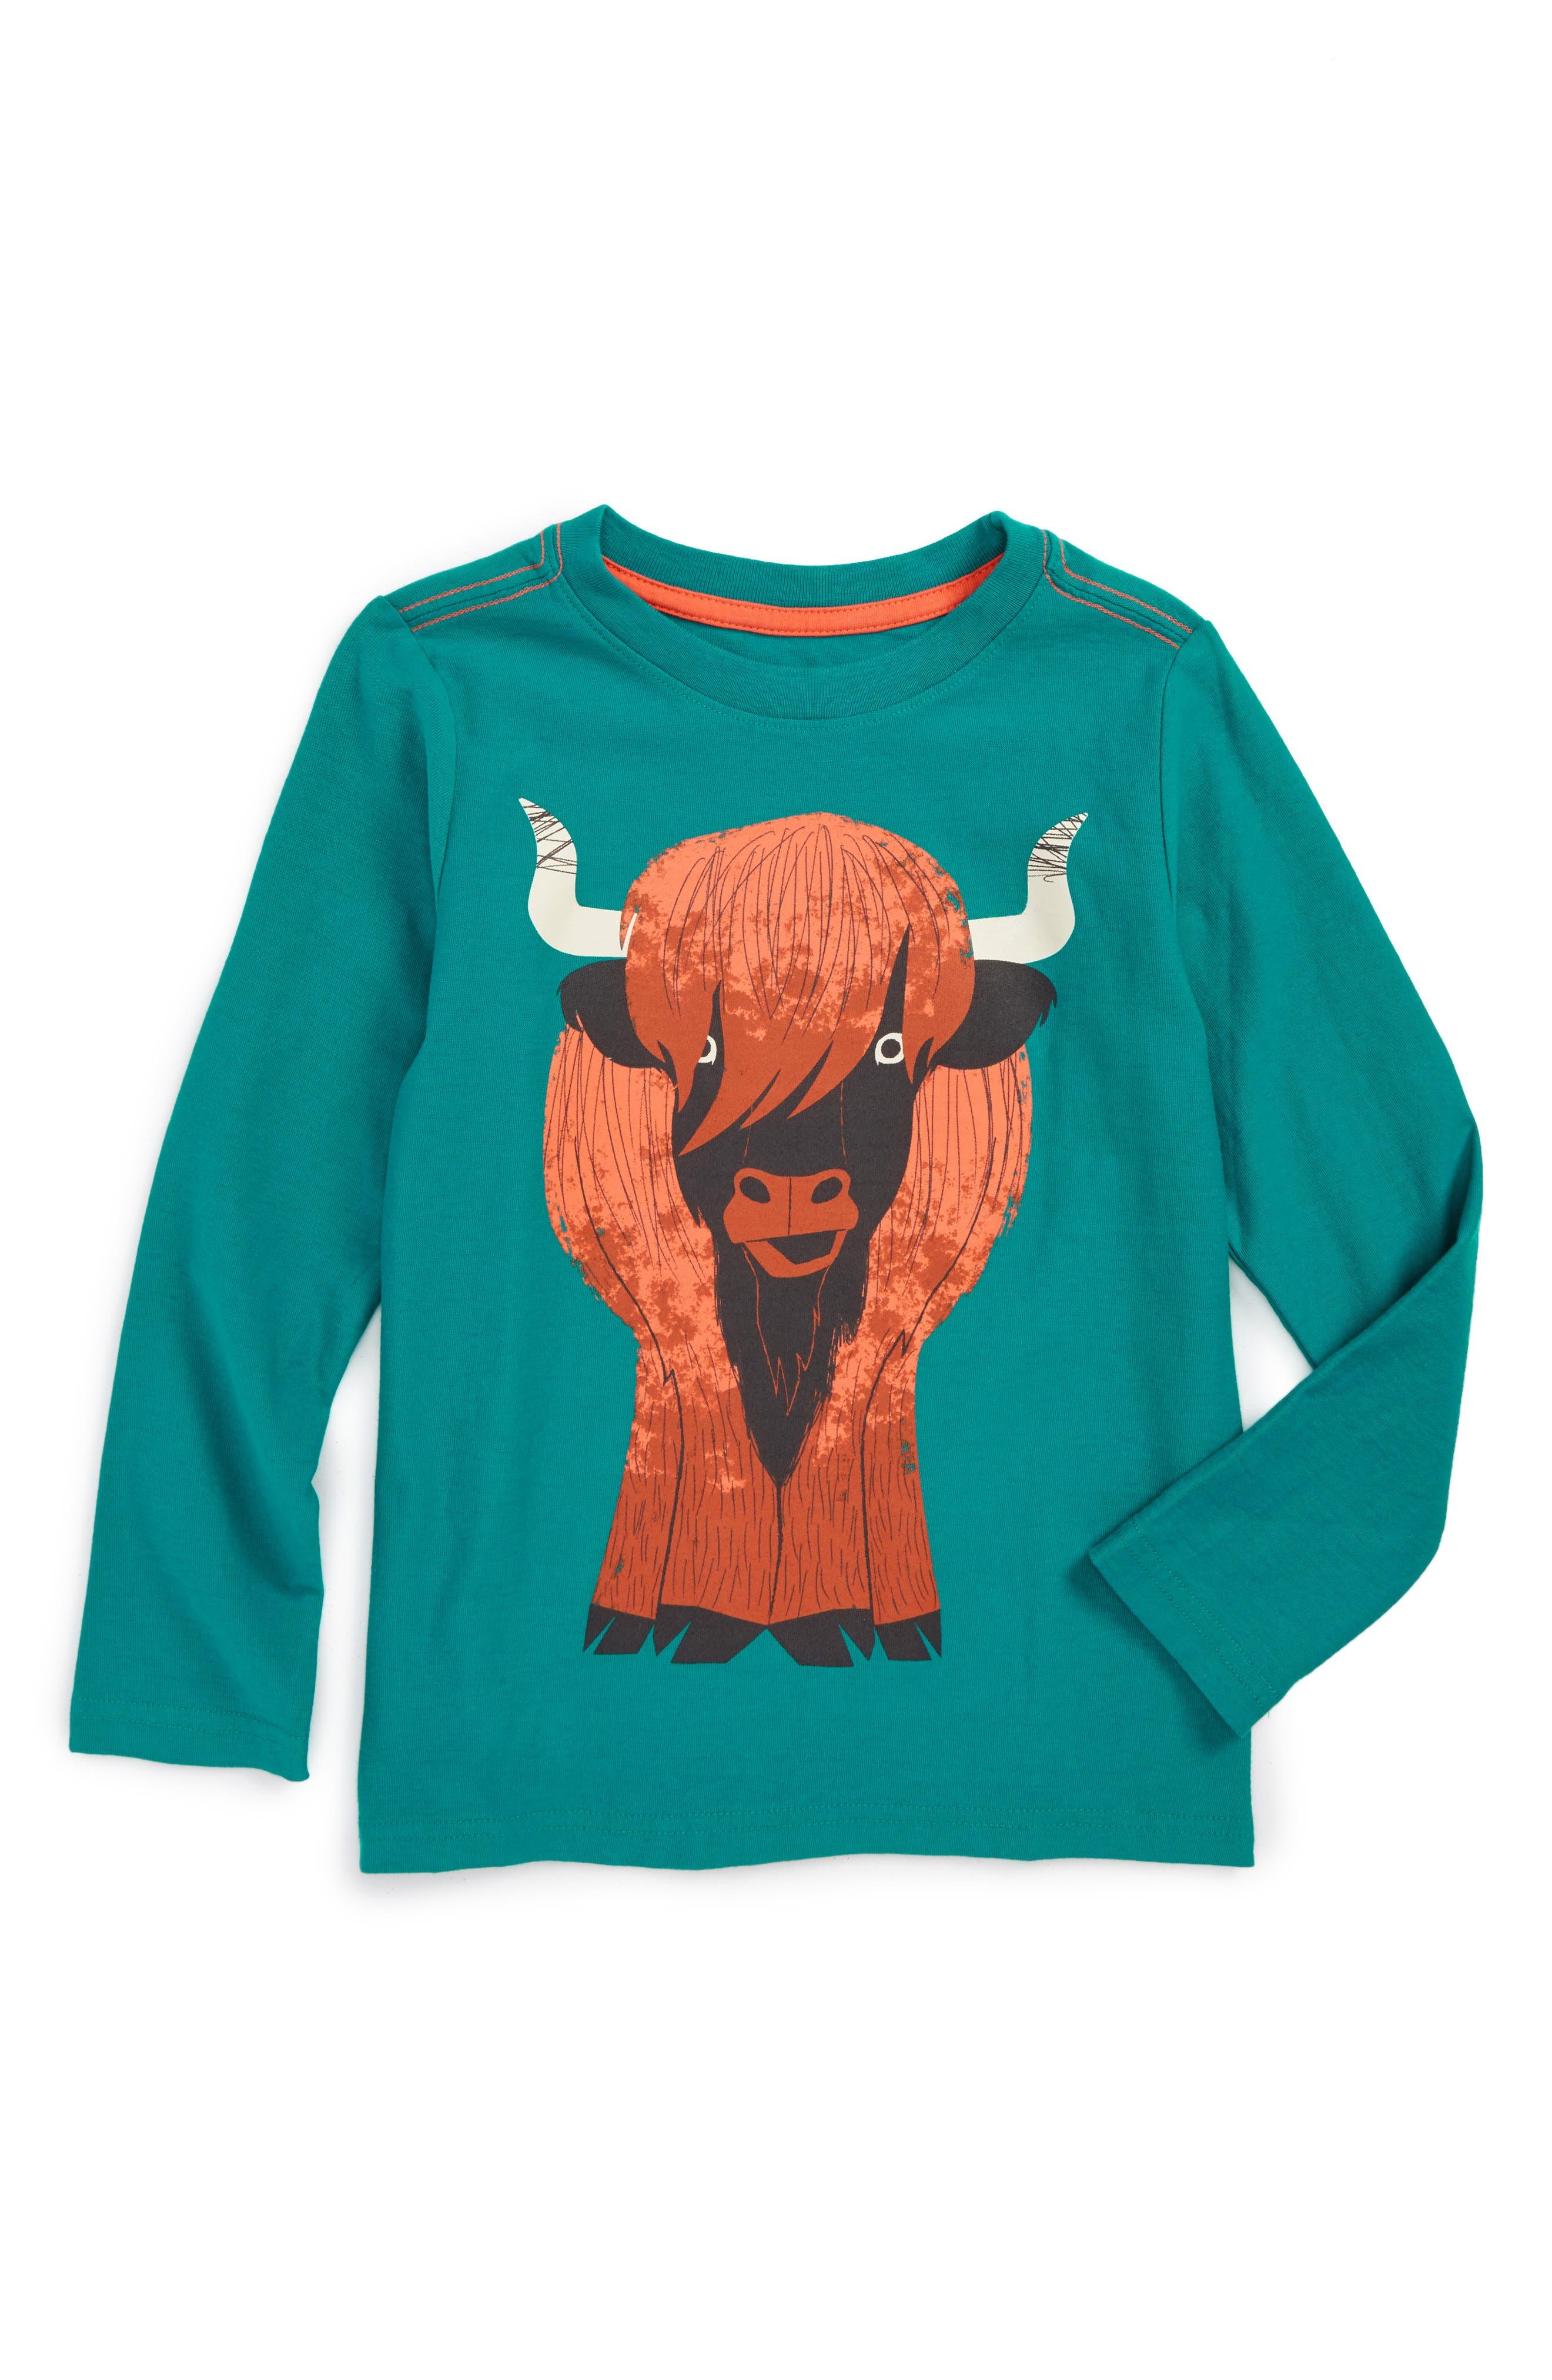 Main Image - Tea Collection Heeland Coo Graphic T-Shirt (Toddler Boys & Little Boys)